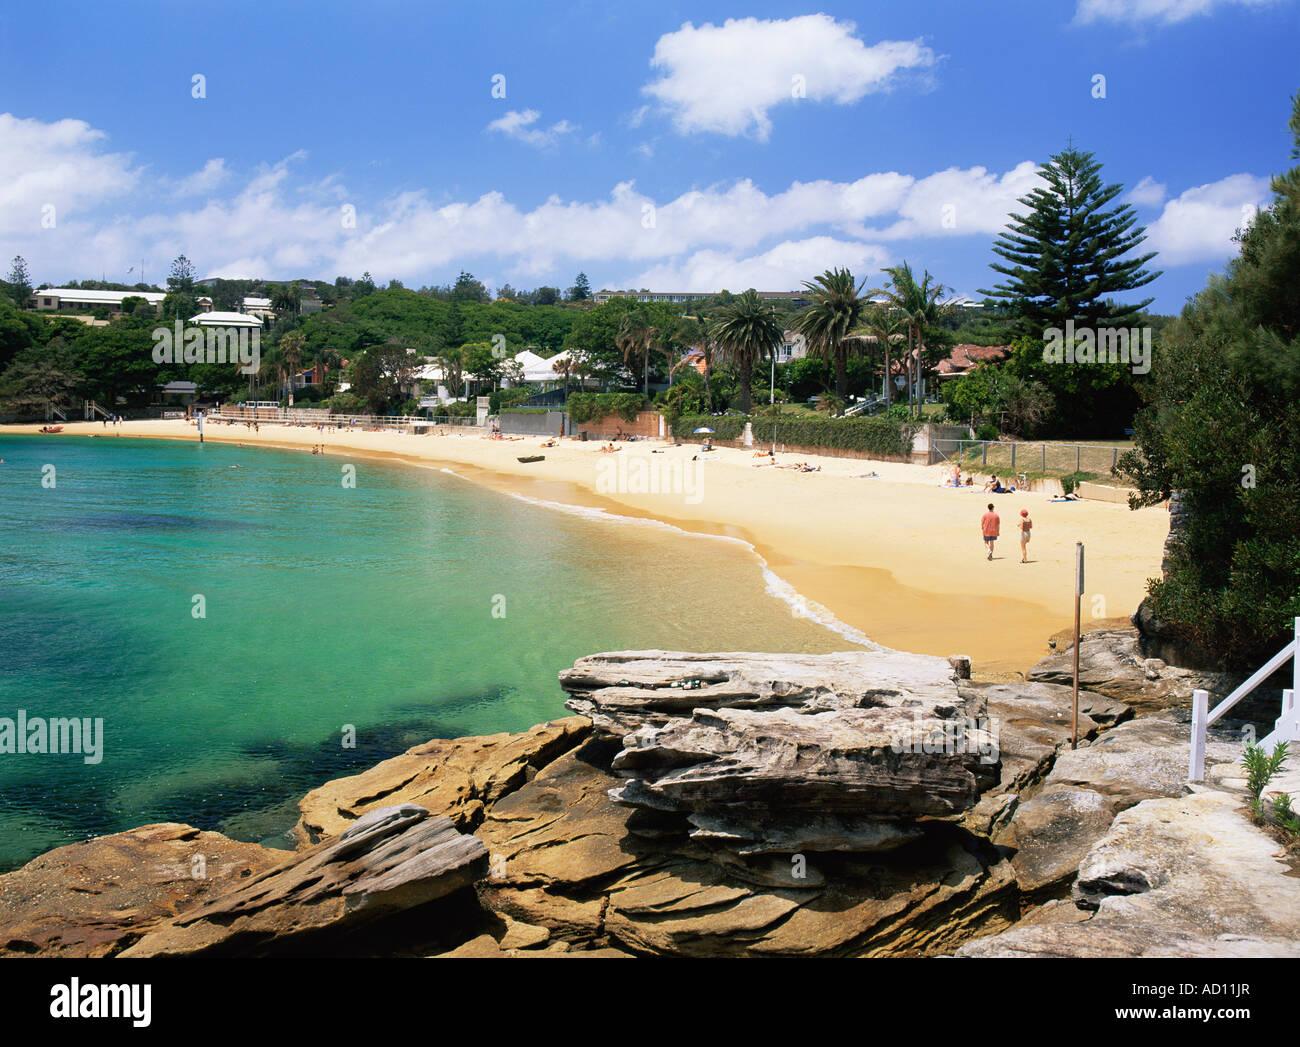 Camp Cove, Watsons Bay, Sydney, NSW, Australia - Stock Image